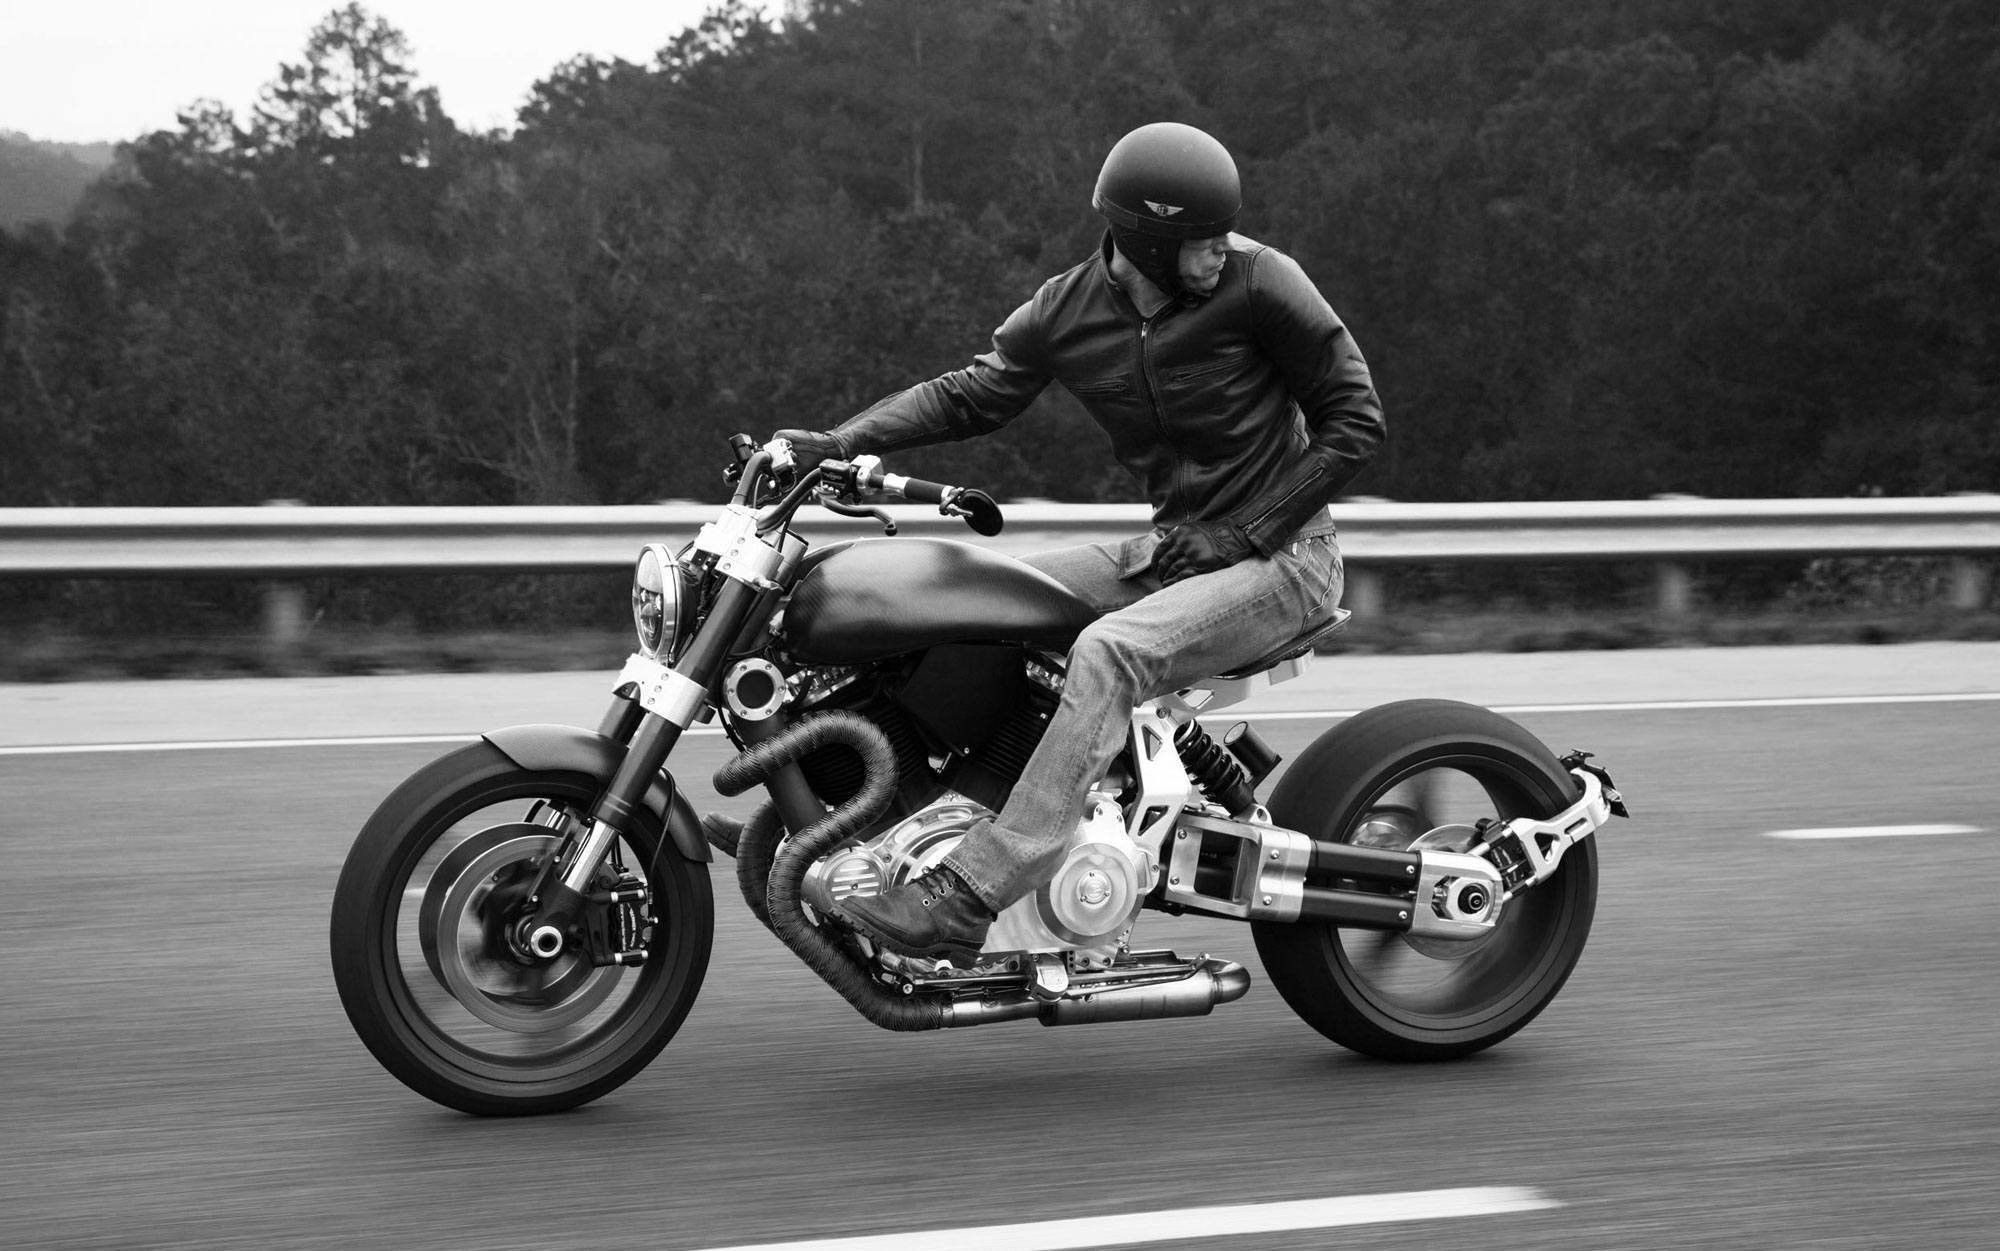 2000x1251, Confederate Motorcycle Superbike Custom - Confederate Motorcycles X132 Hellcat - HD Wallpaper